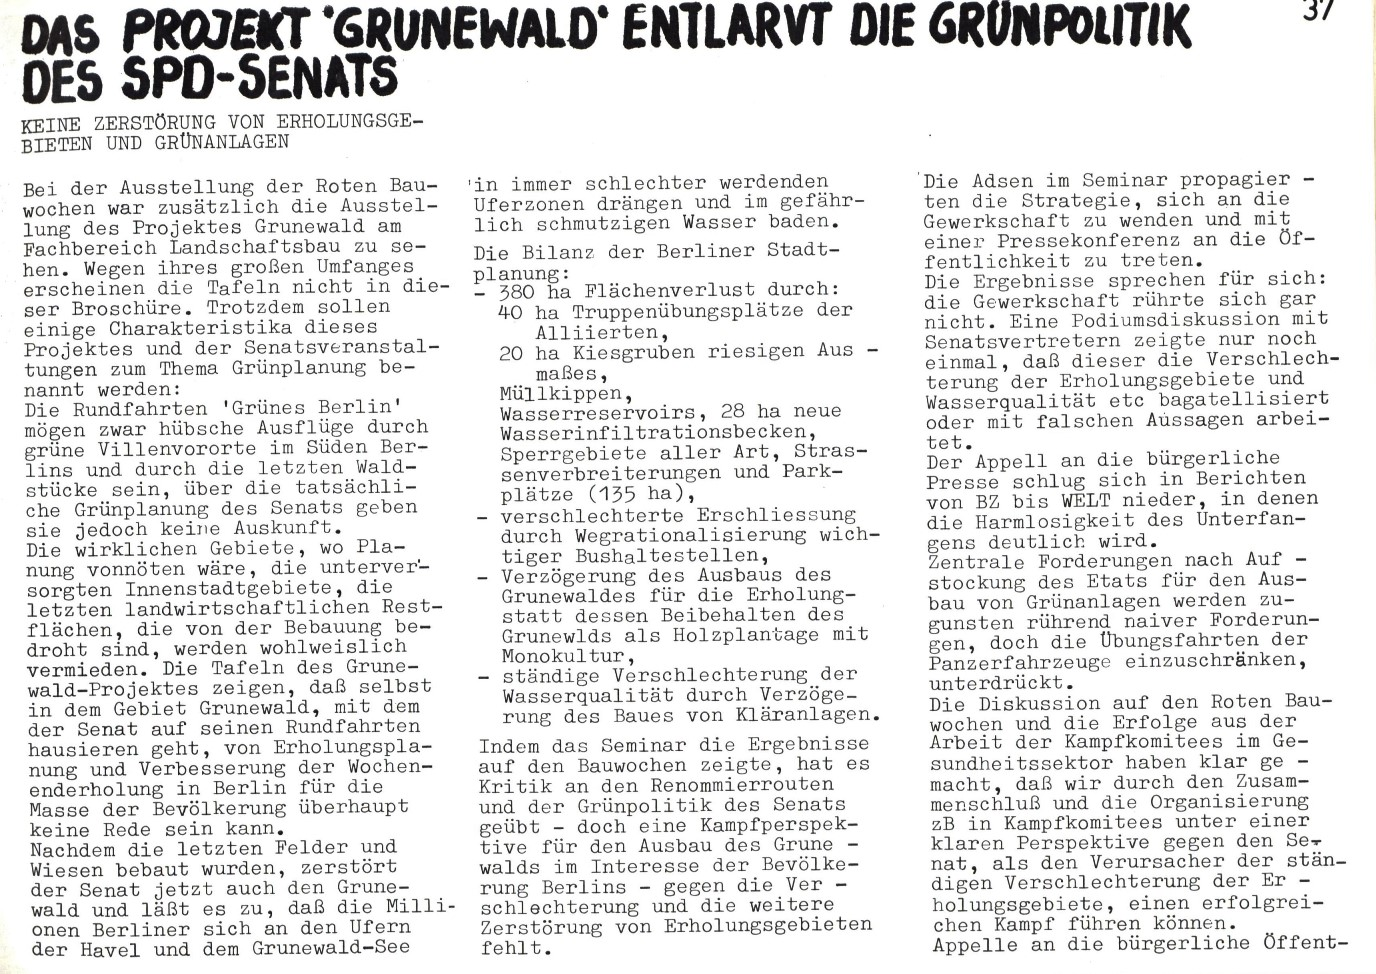 Berlin_KSV_1974_Rote_Bauwochen_49